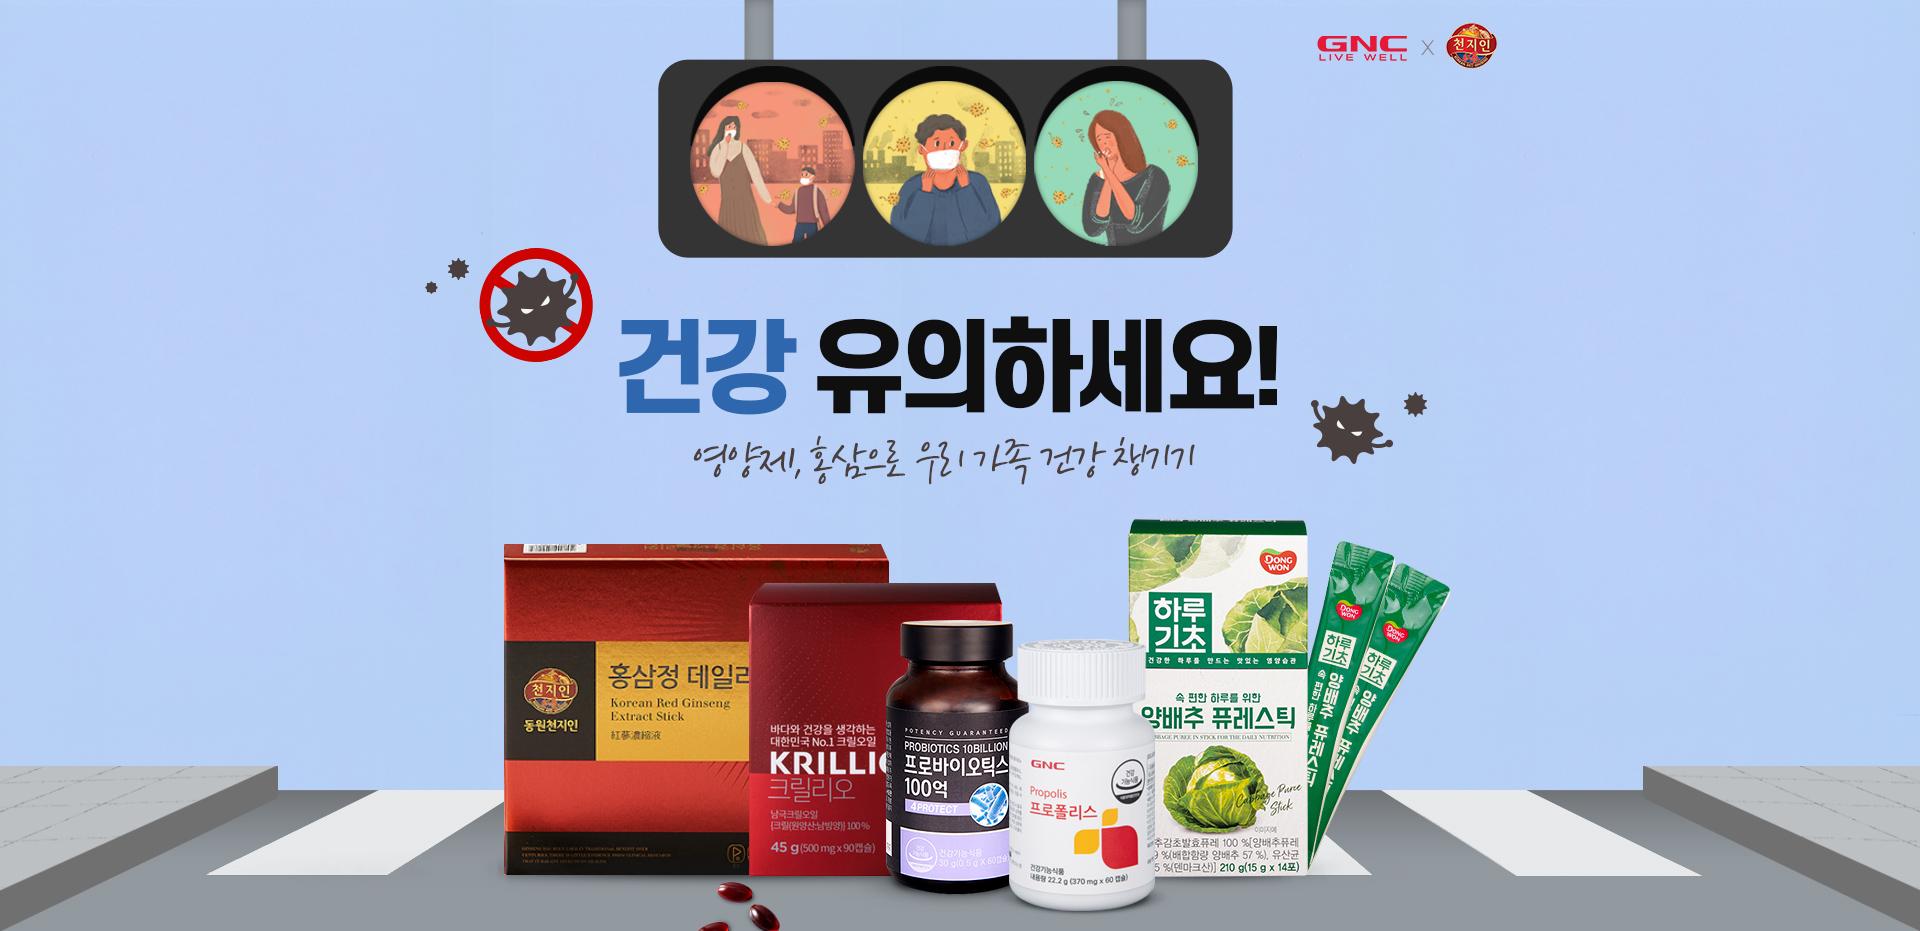 GNC X 천지인 건강 유의하세요! 영양제/홍삼으로 우리 가족 건강 챙기기